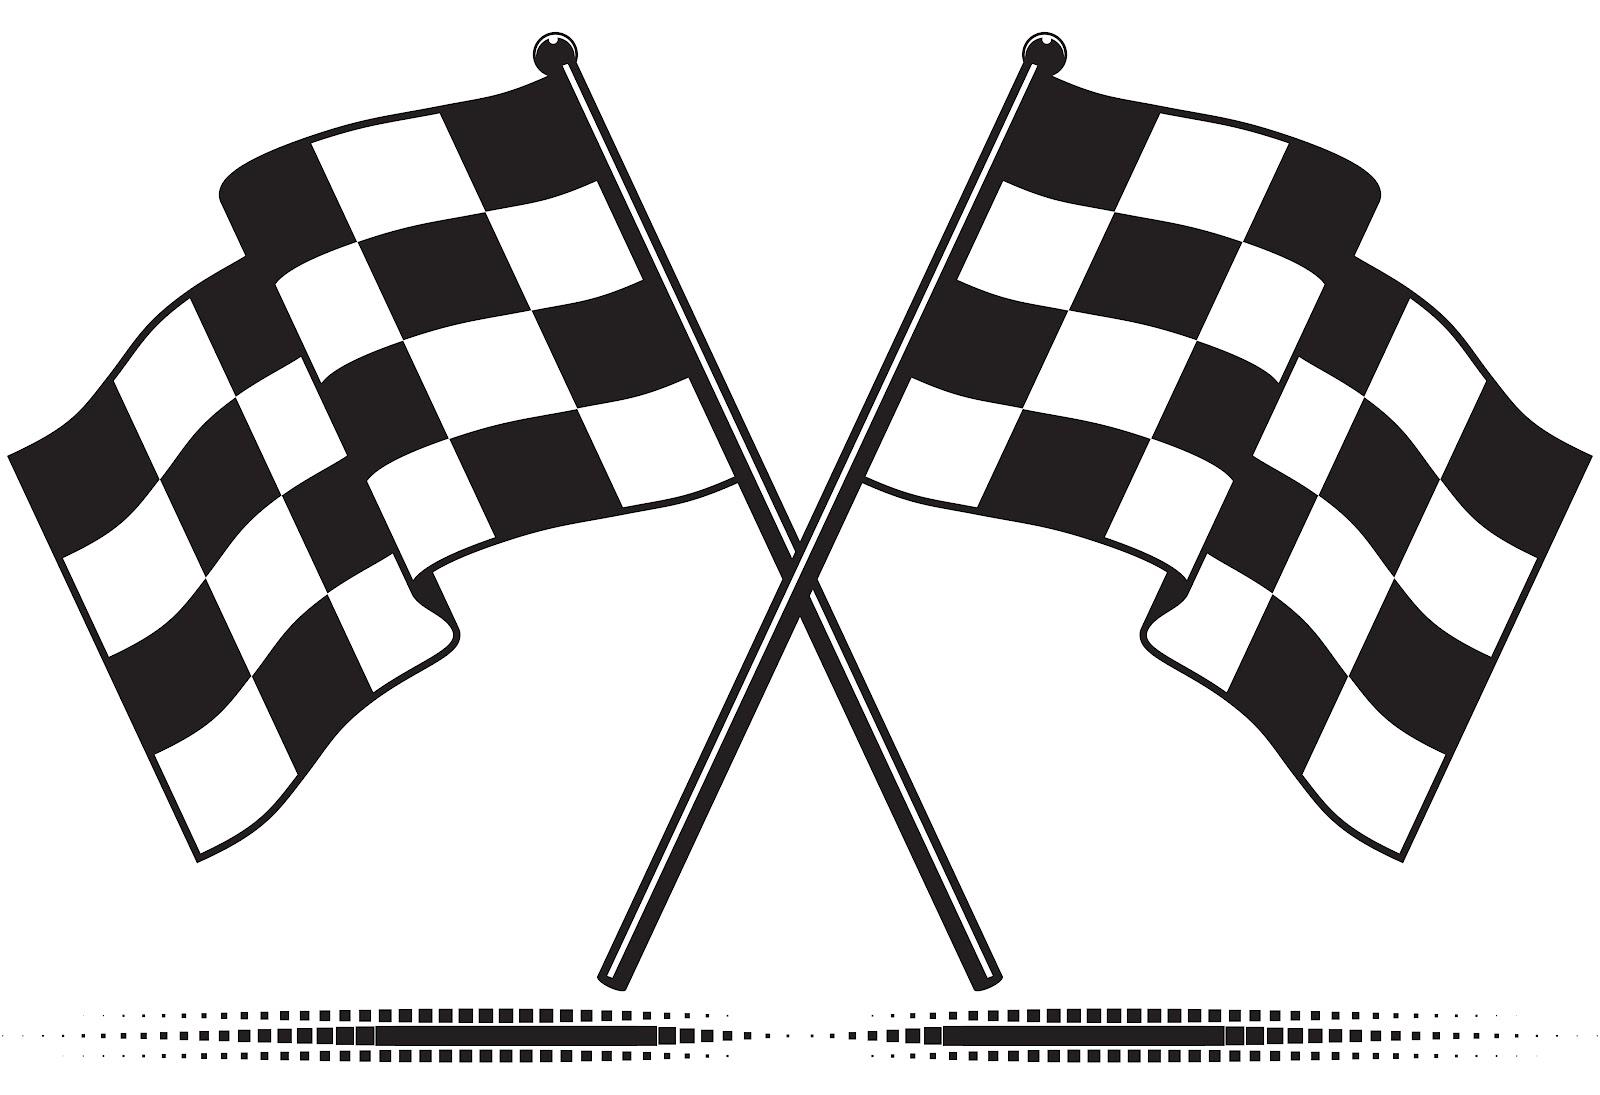 Adrenaline Adventures And Nascar Racing -Adrenaline Adventures And Nascar Racing Experience To Theiroptions-0